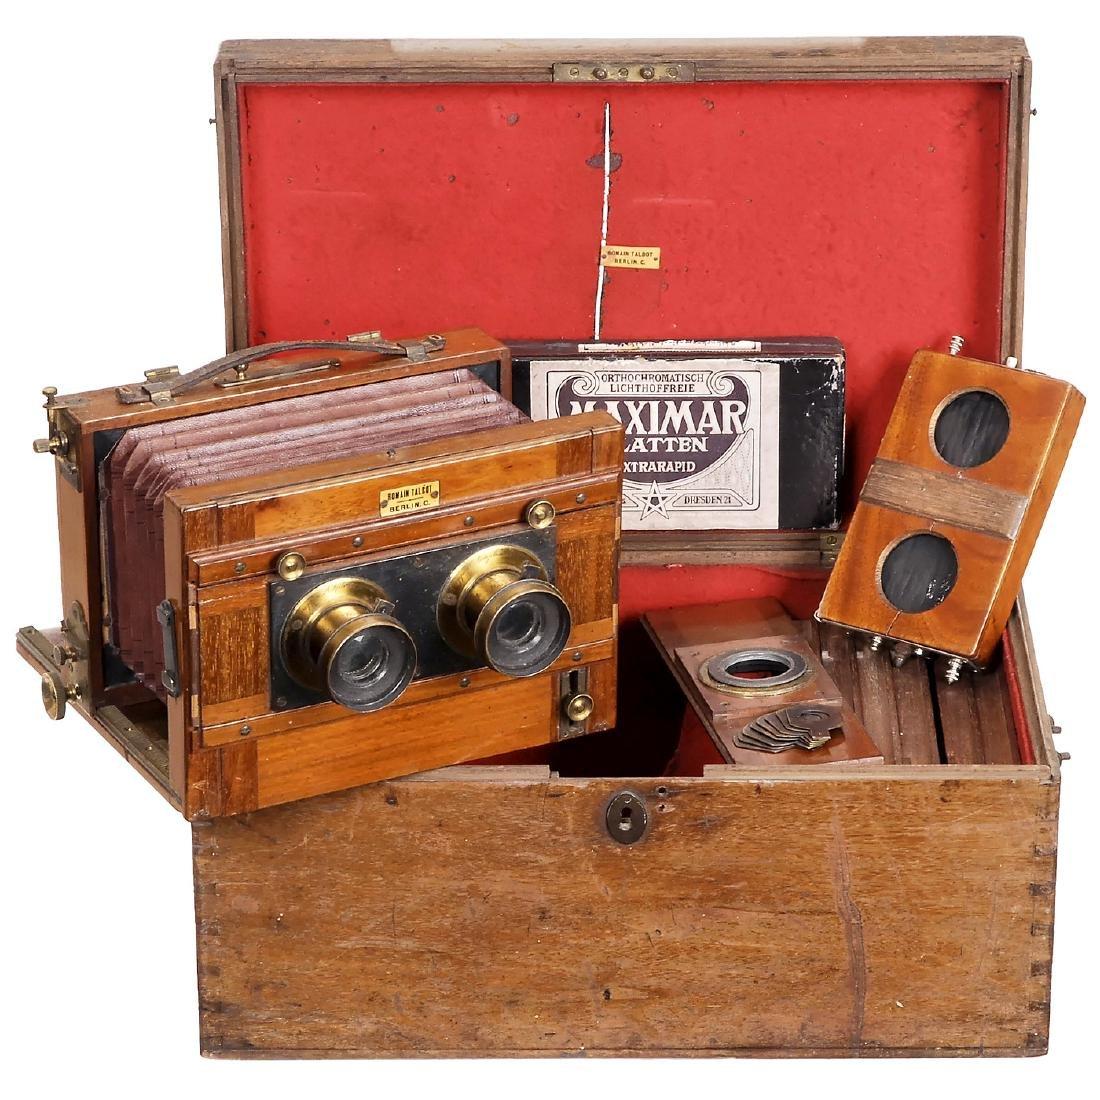 Stereo Camera 9 x 18 cm by Romain Talbot, Berlin, c.